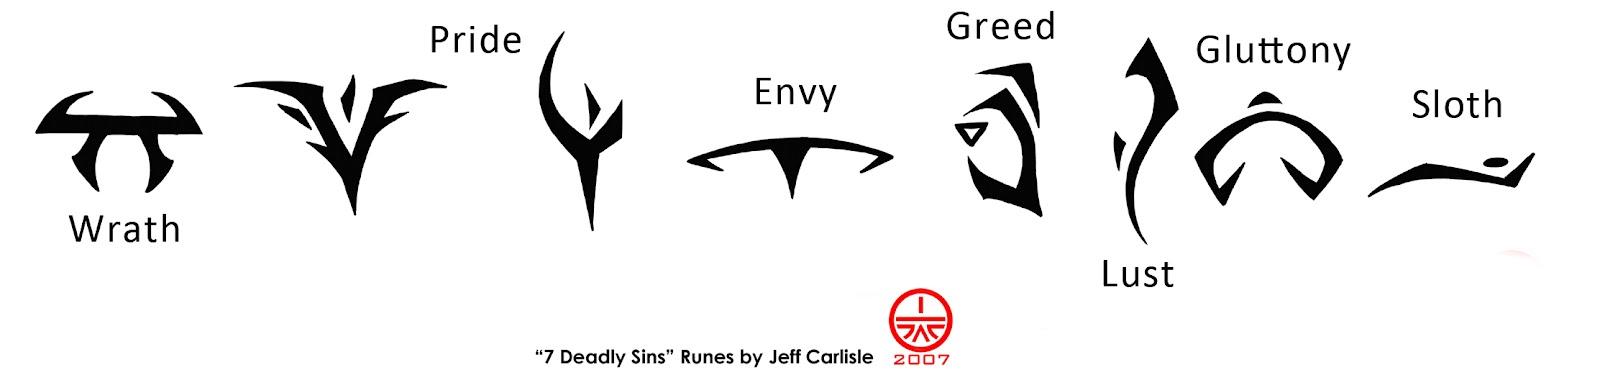 viking runer betydning